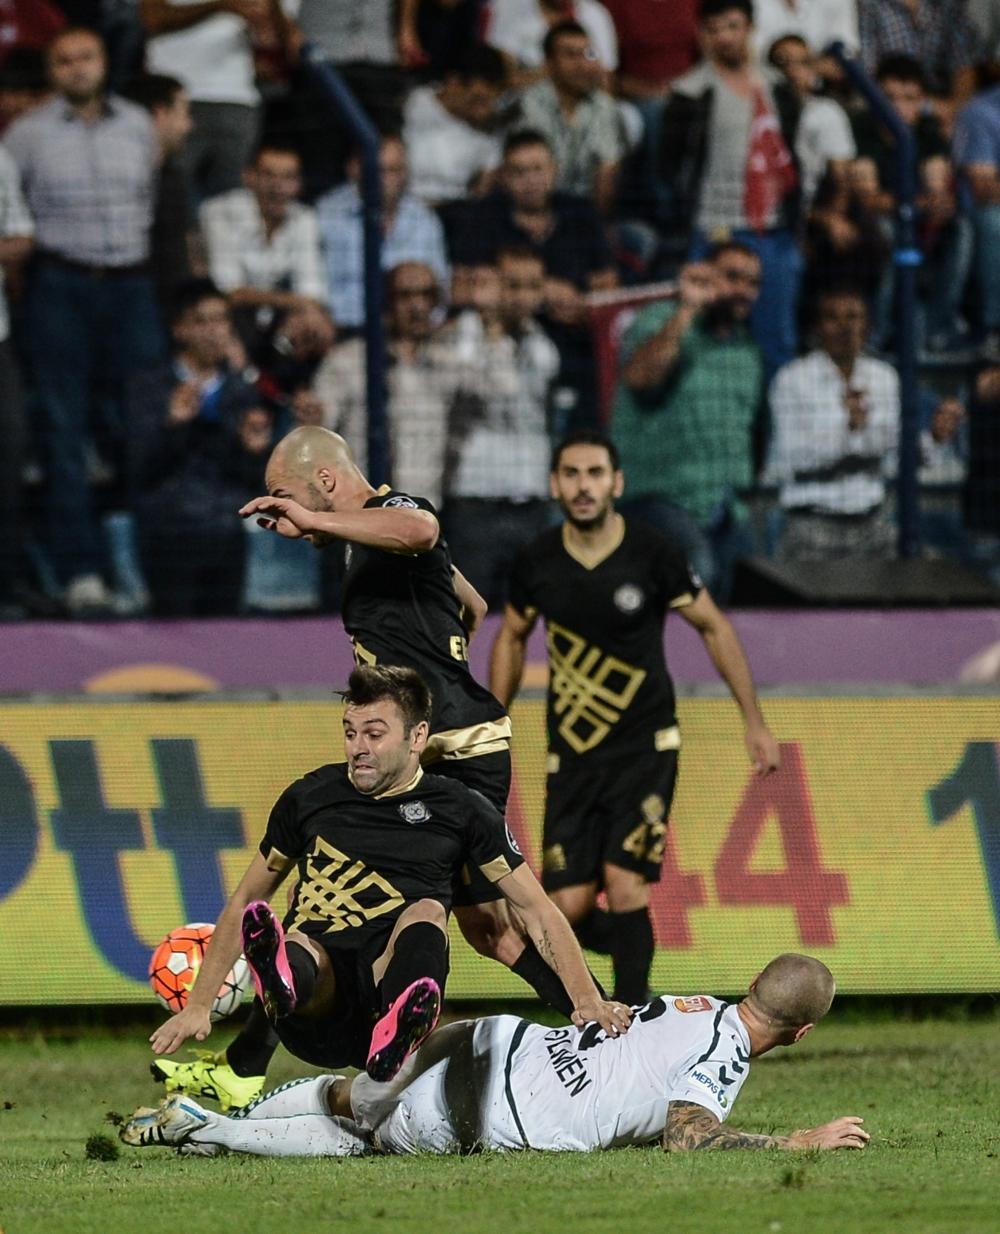 Osmanlıspor-Torku Konyaspor: 1-2 22